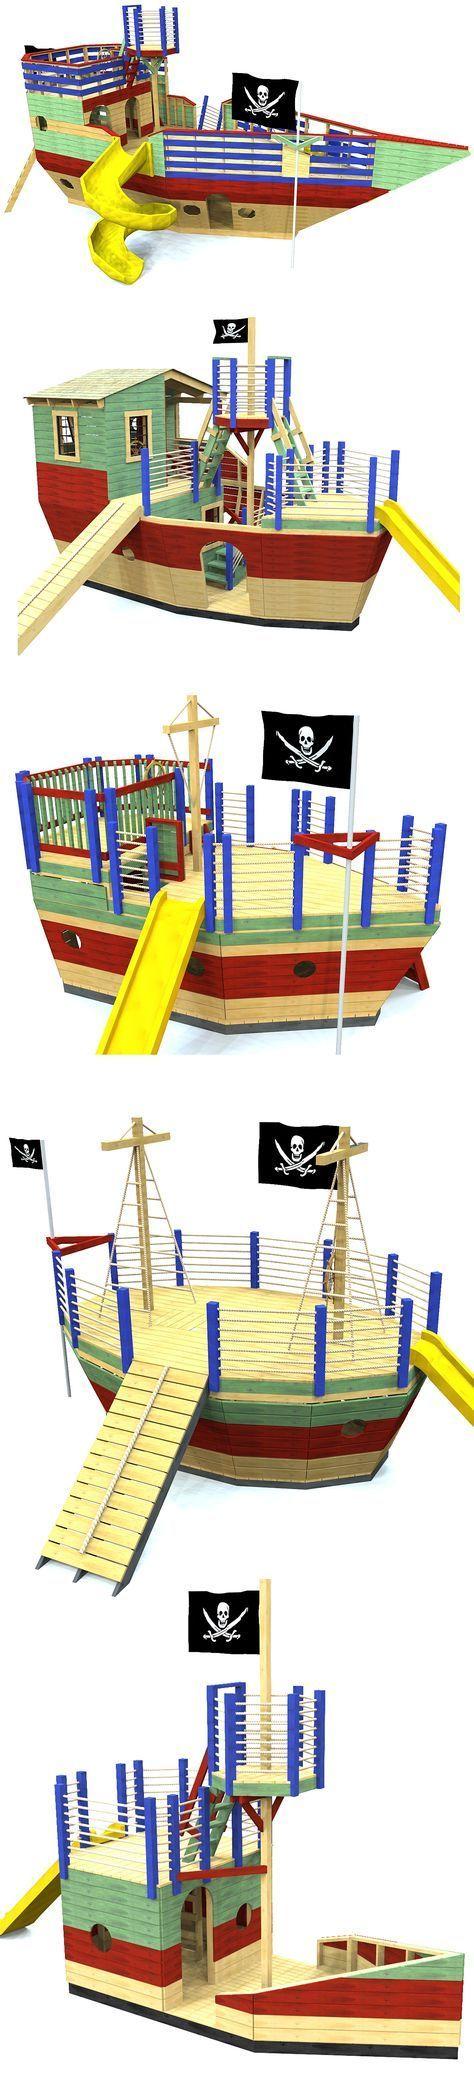 5 backyard pirate ship playhouse plans you can build ...